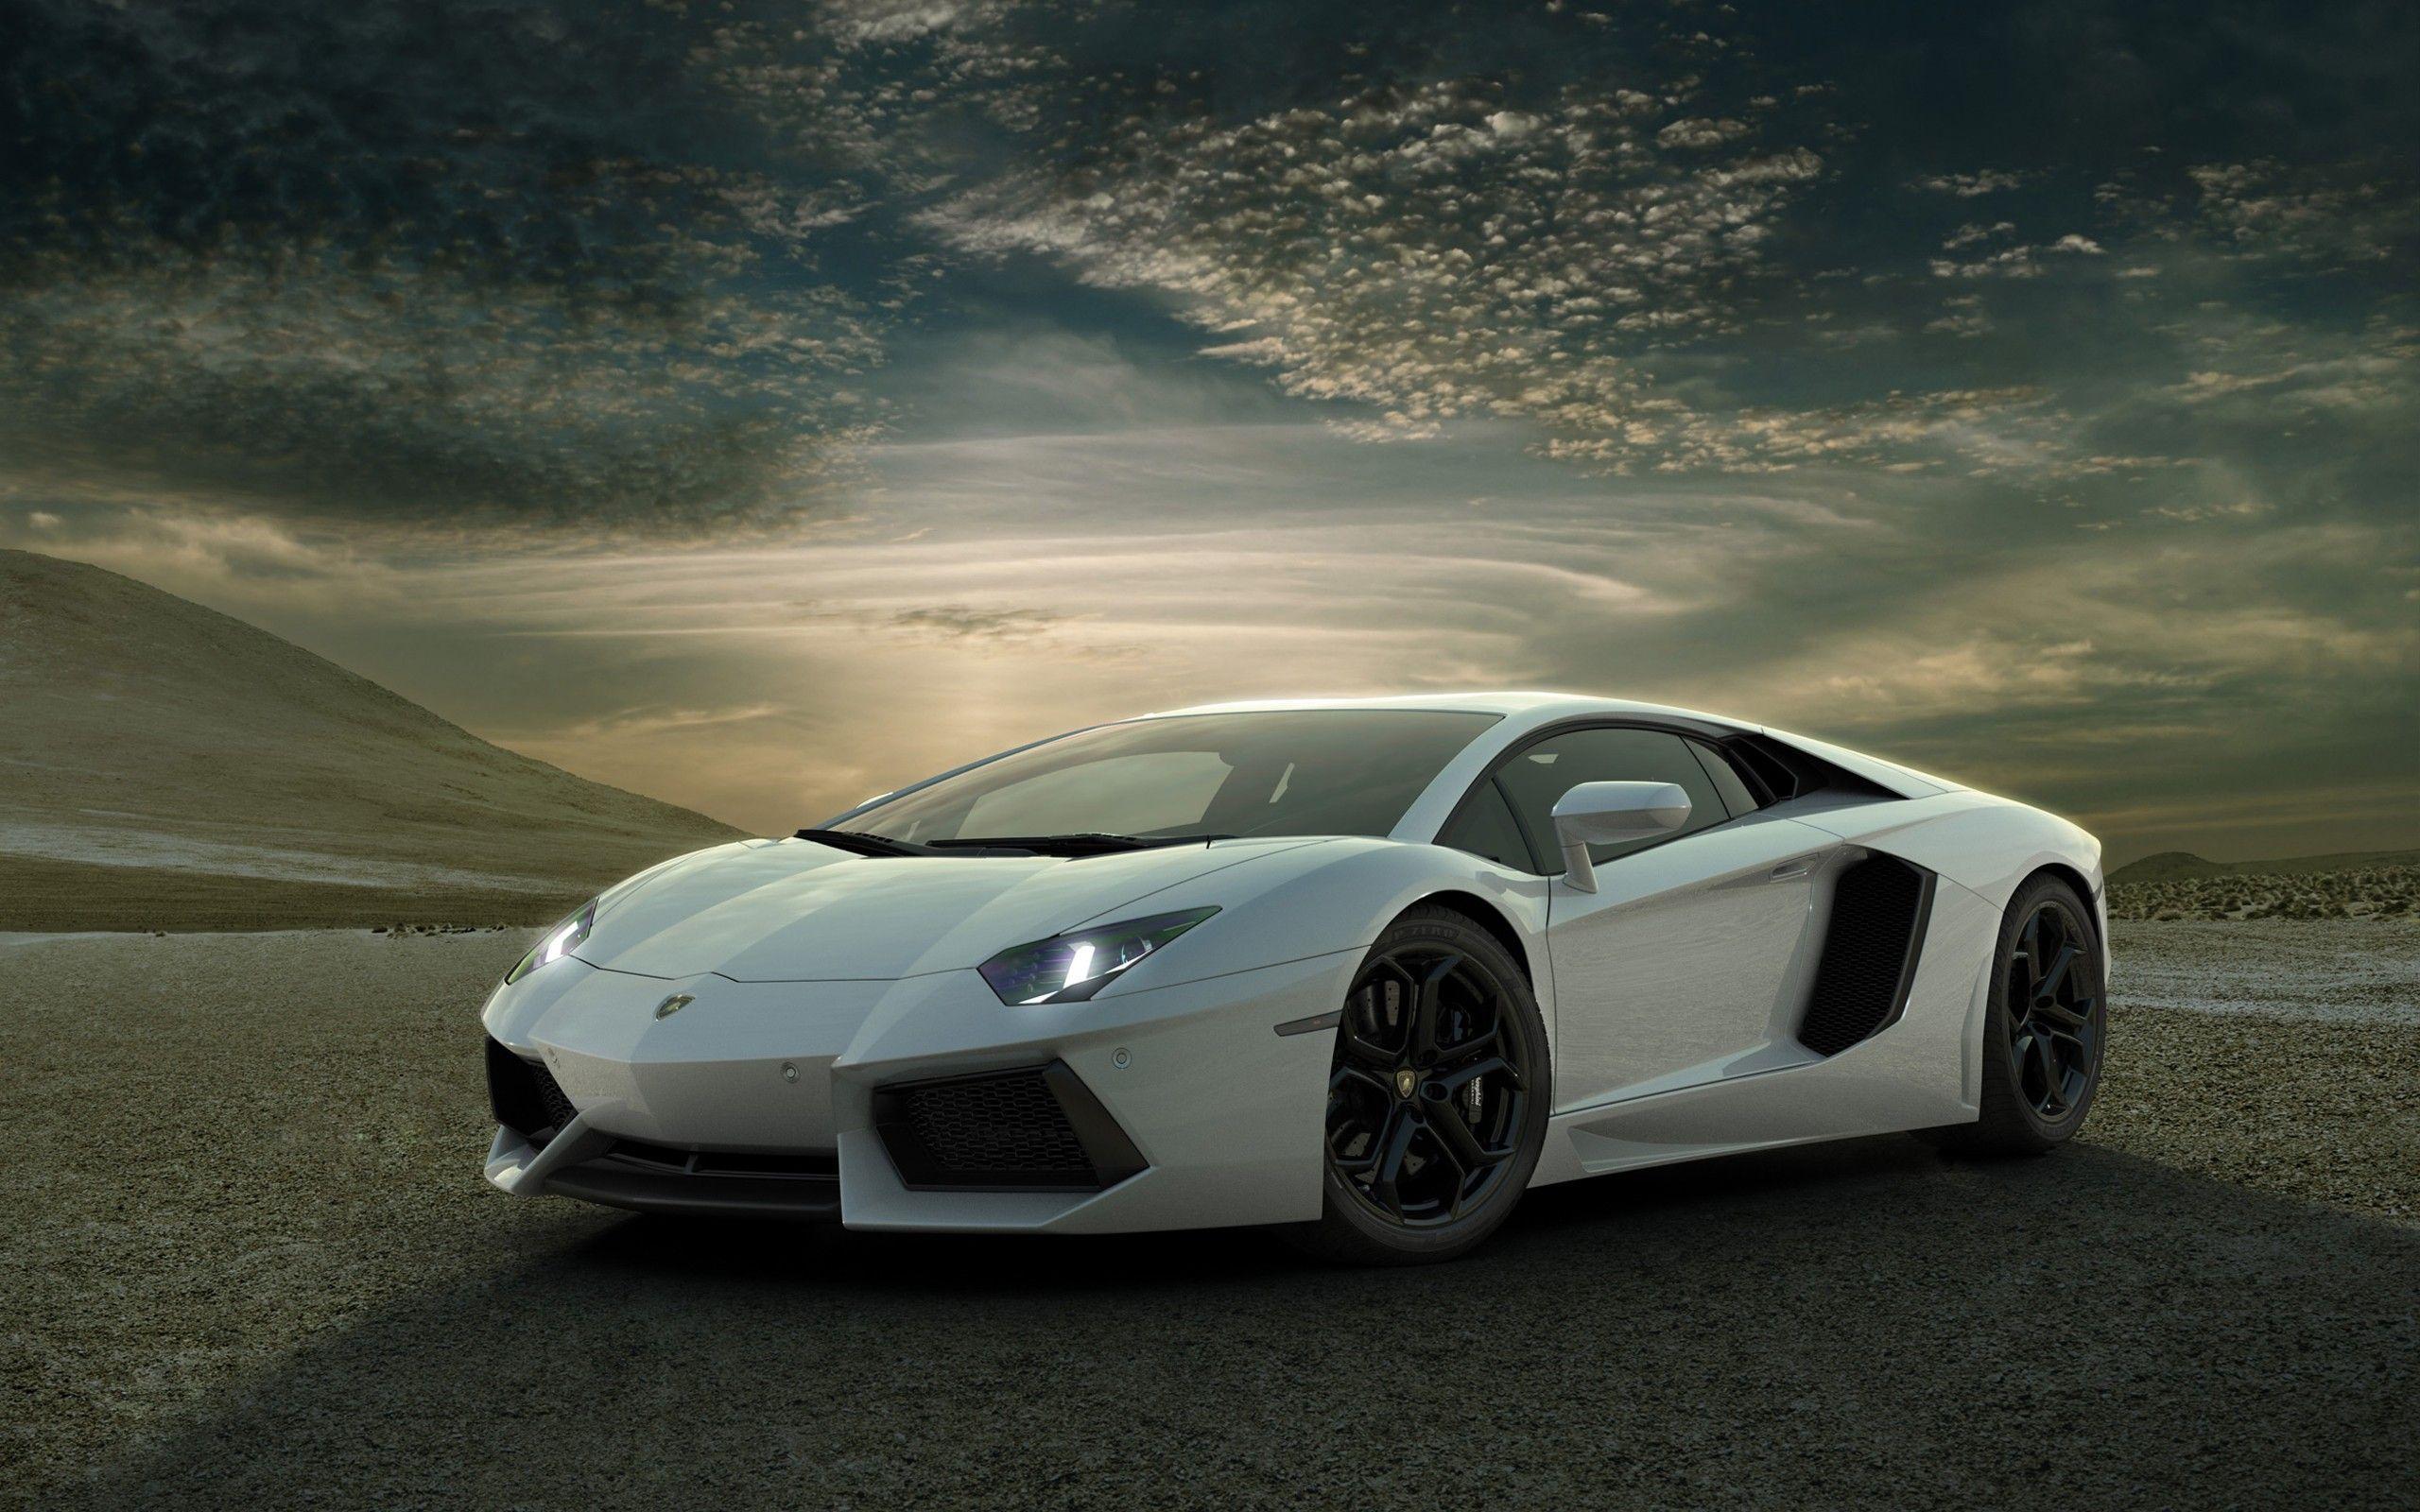 Lamborghini reventon wallpaper